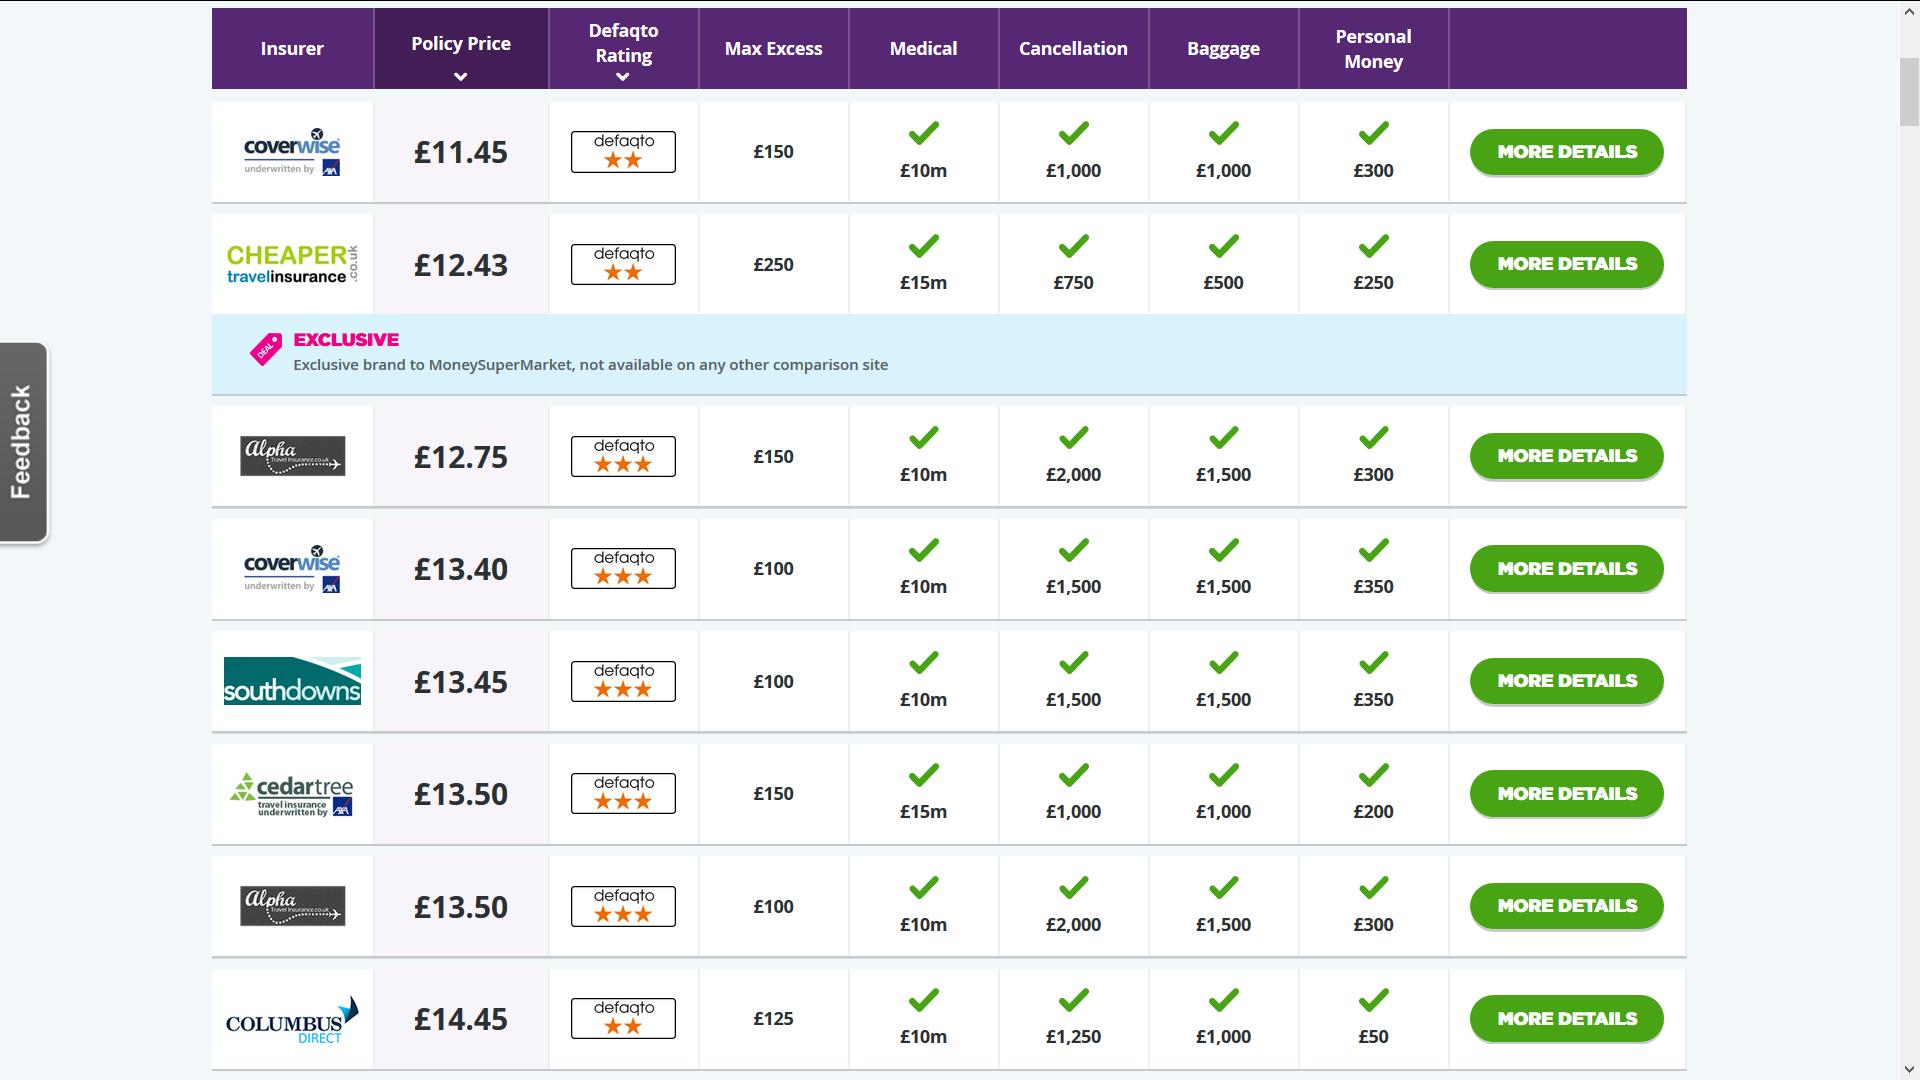 Image-14-pocruises-travel-insurance-comparison-table | AardvarkCompare.com